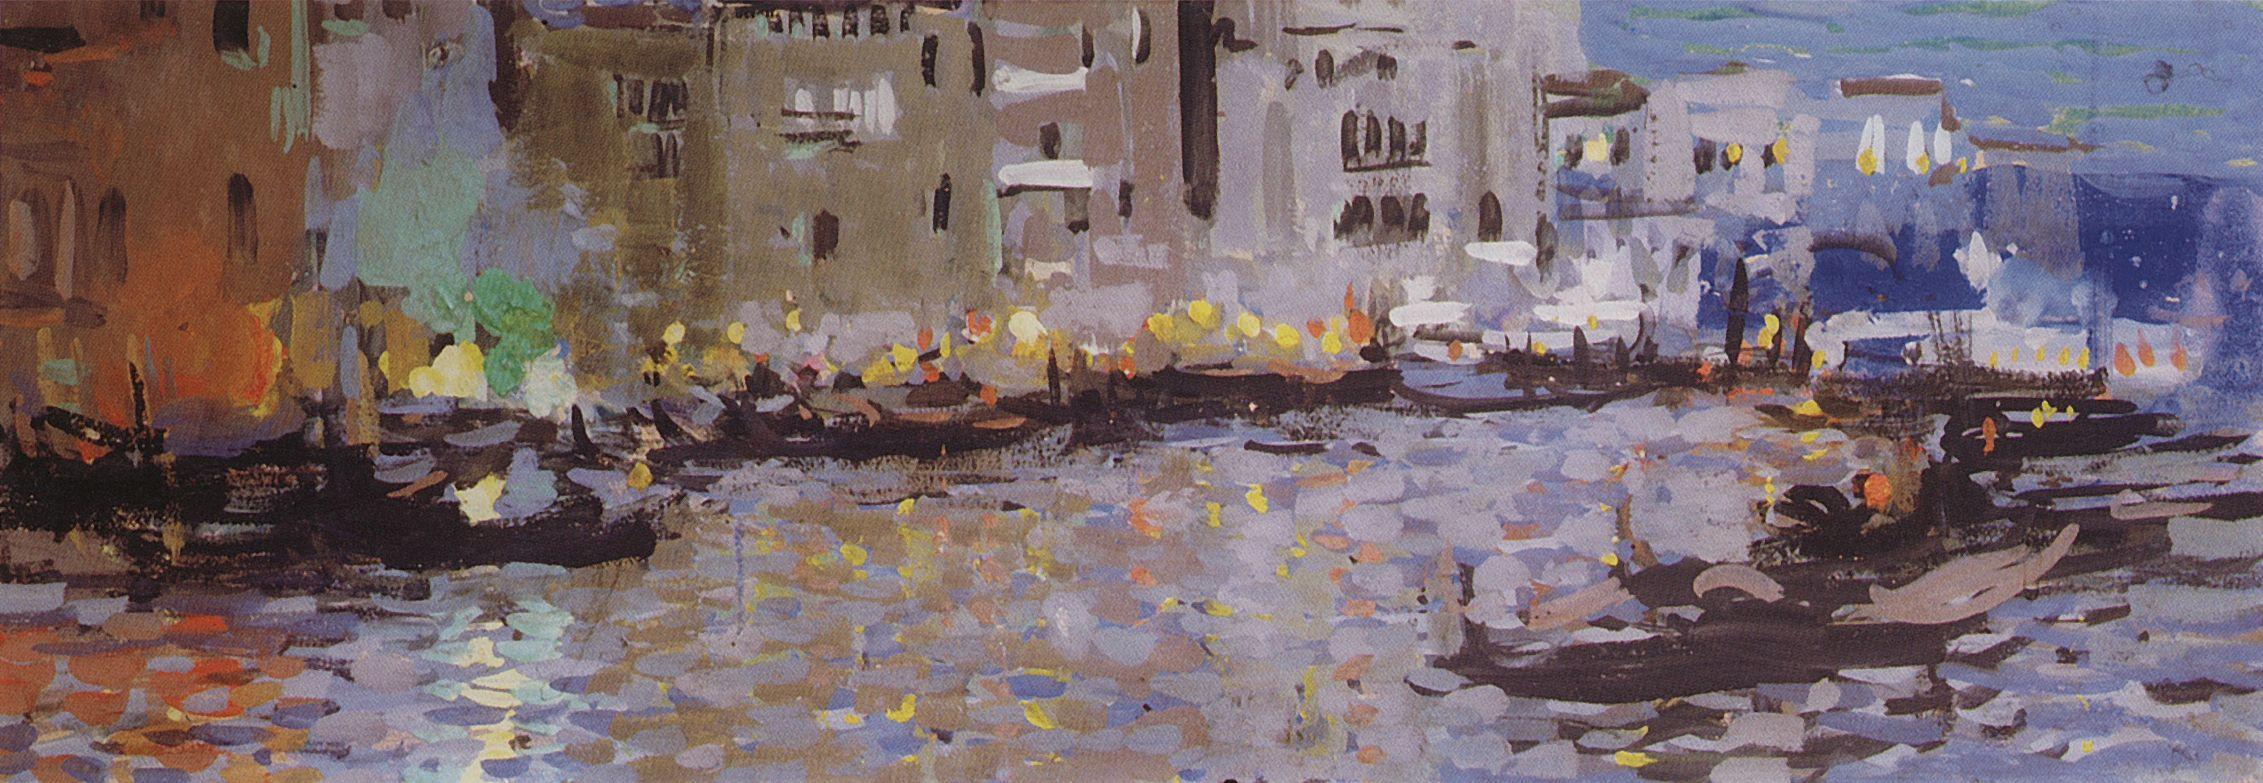 Константин Алексеевич Коровин. Венеция